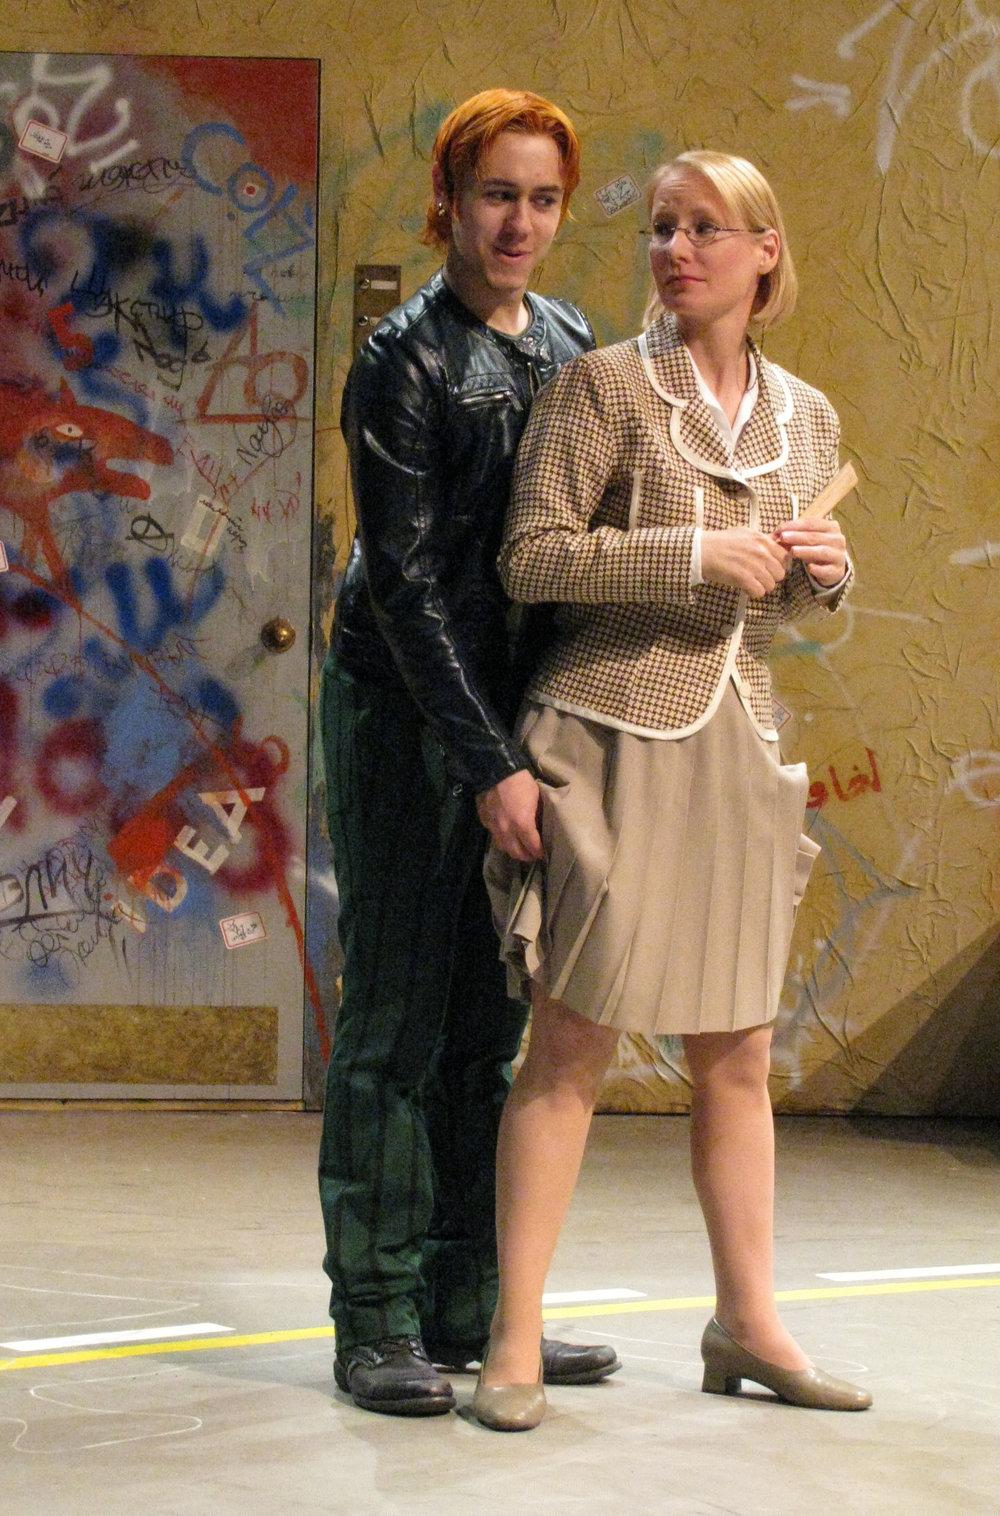 mercutio--nurse_8300351507_o.jpg